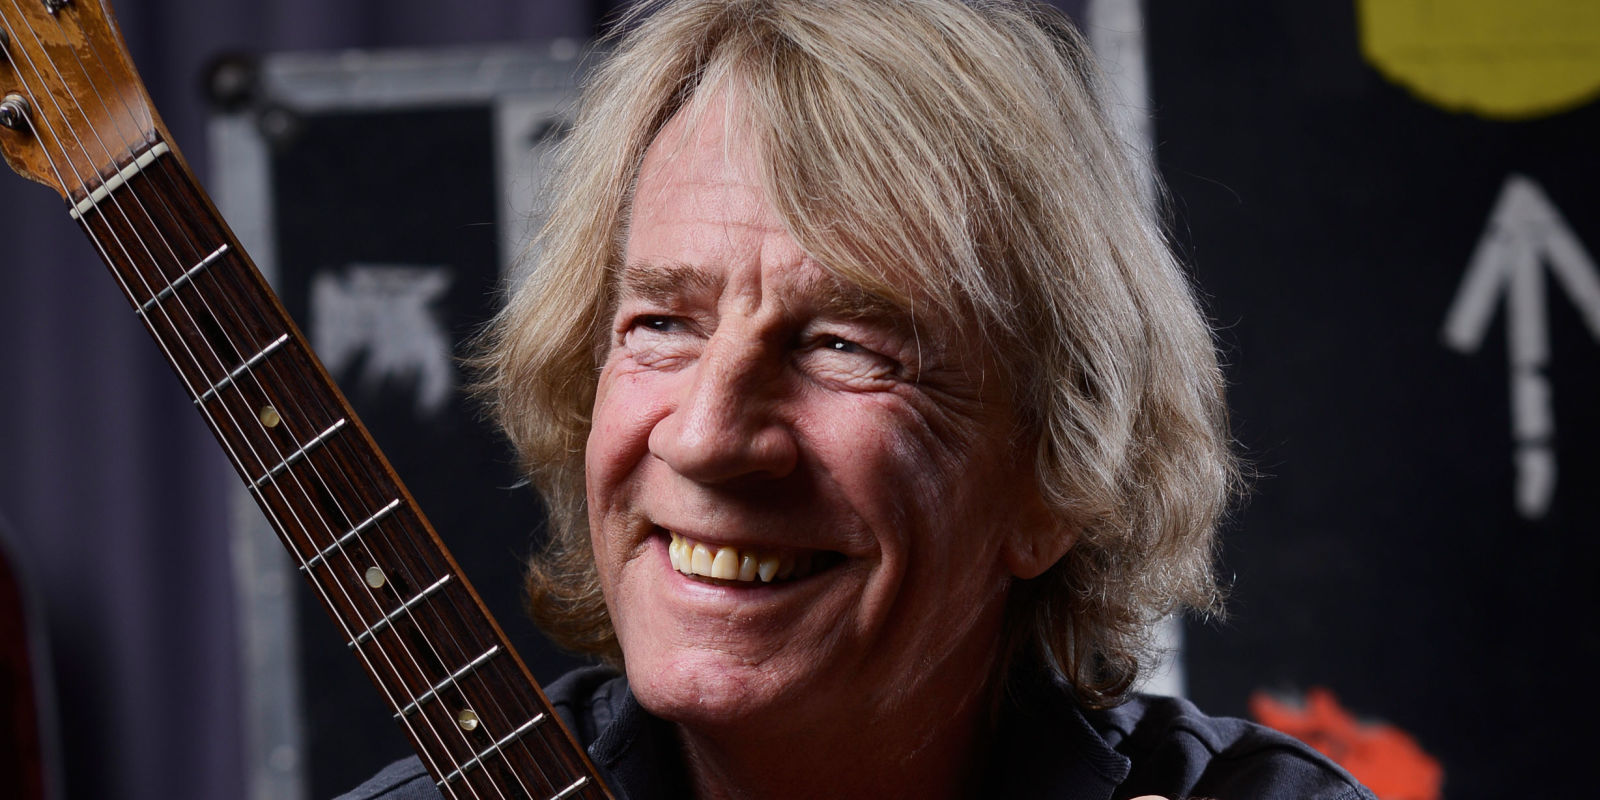 Marvel Girls Wallpaper Status Quo Guitarist Rick Parfitt Dies Aged 68